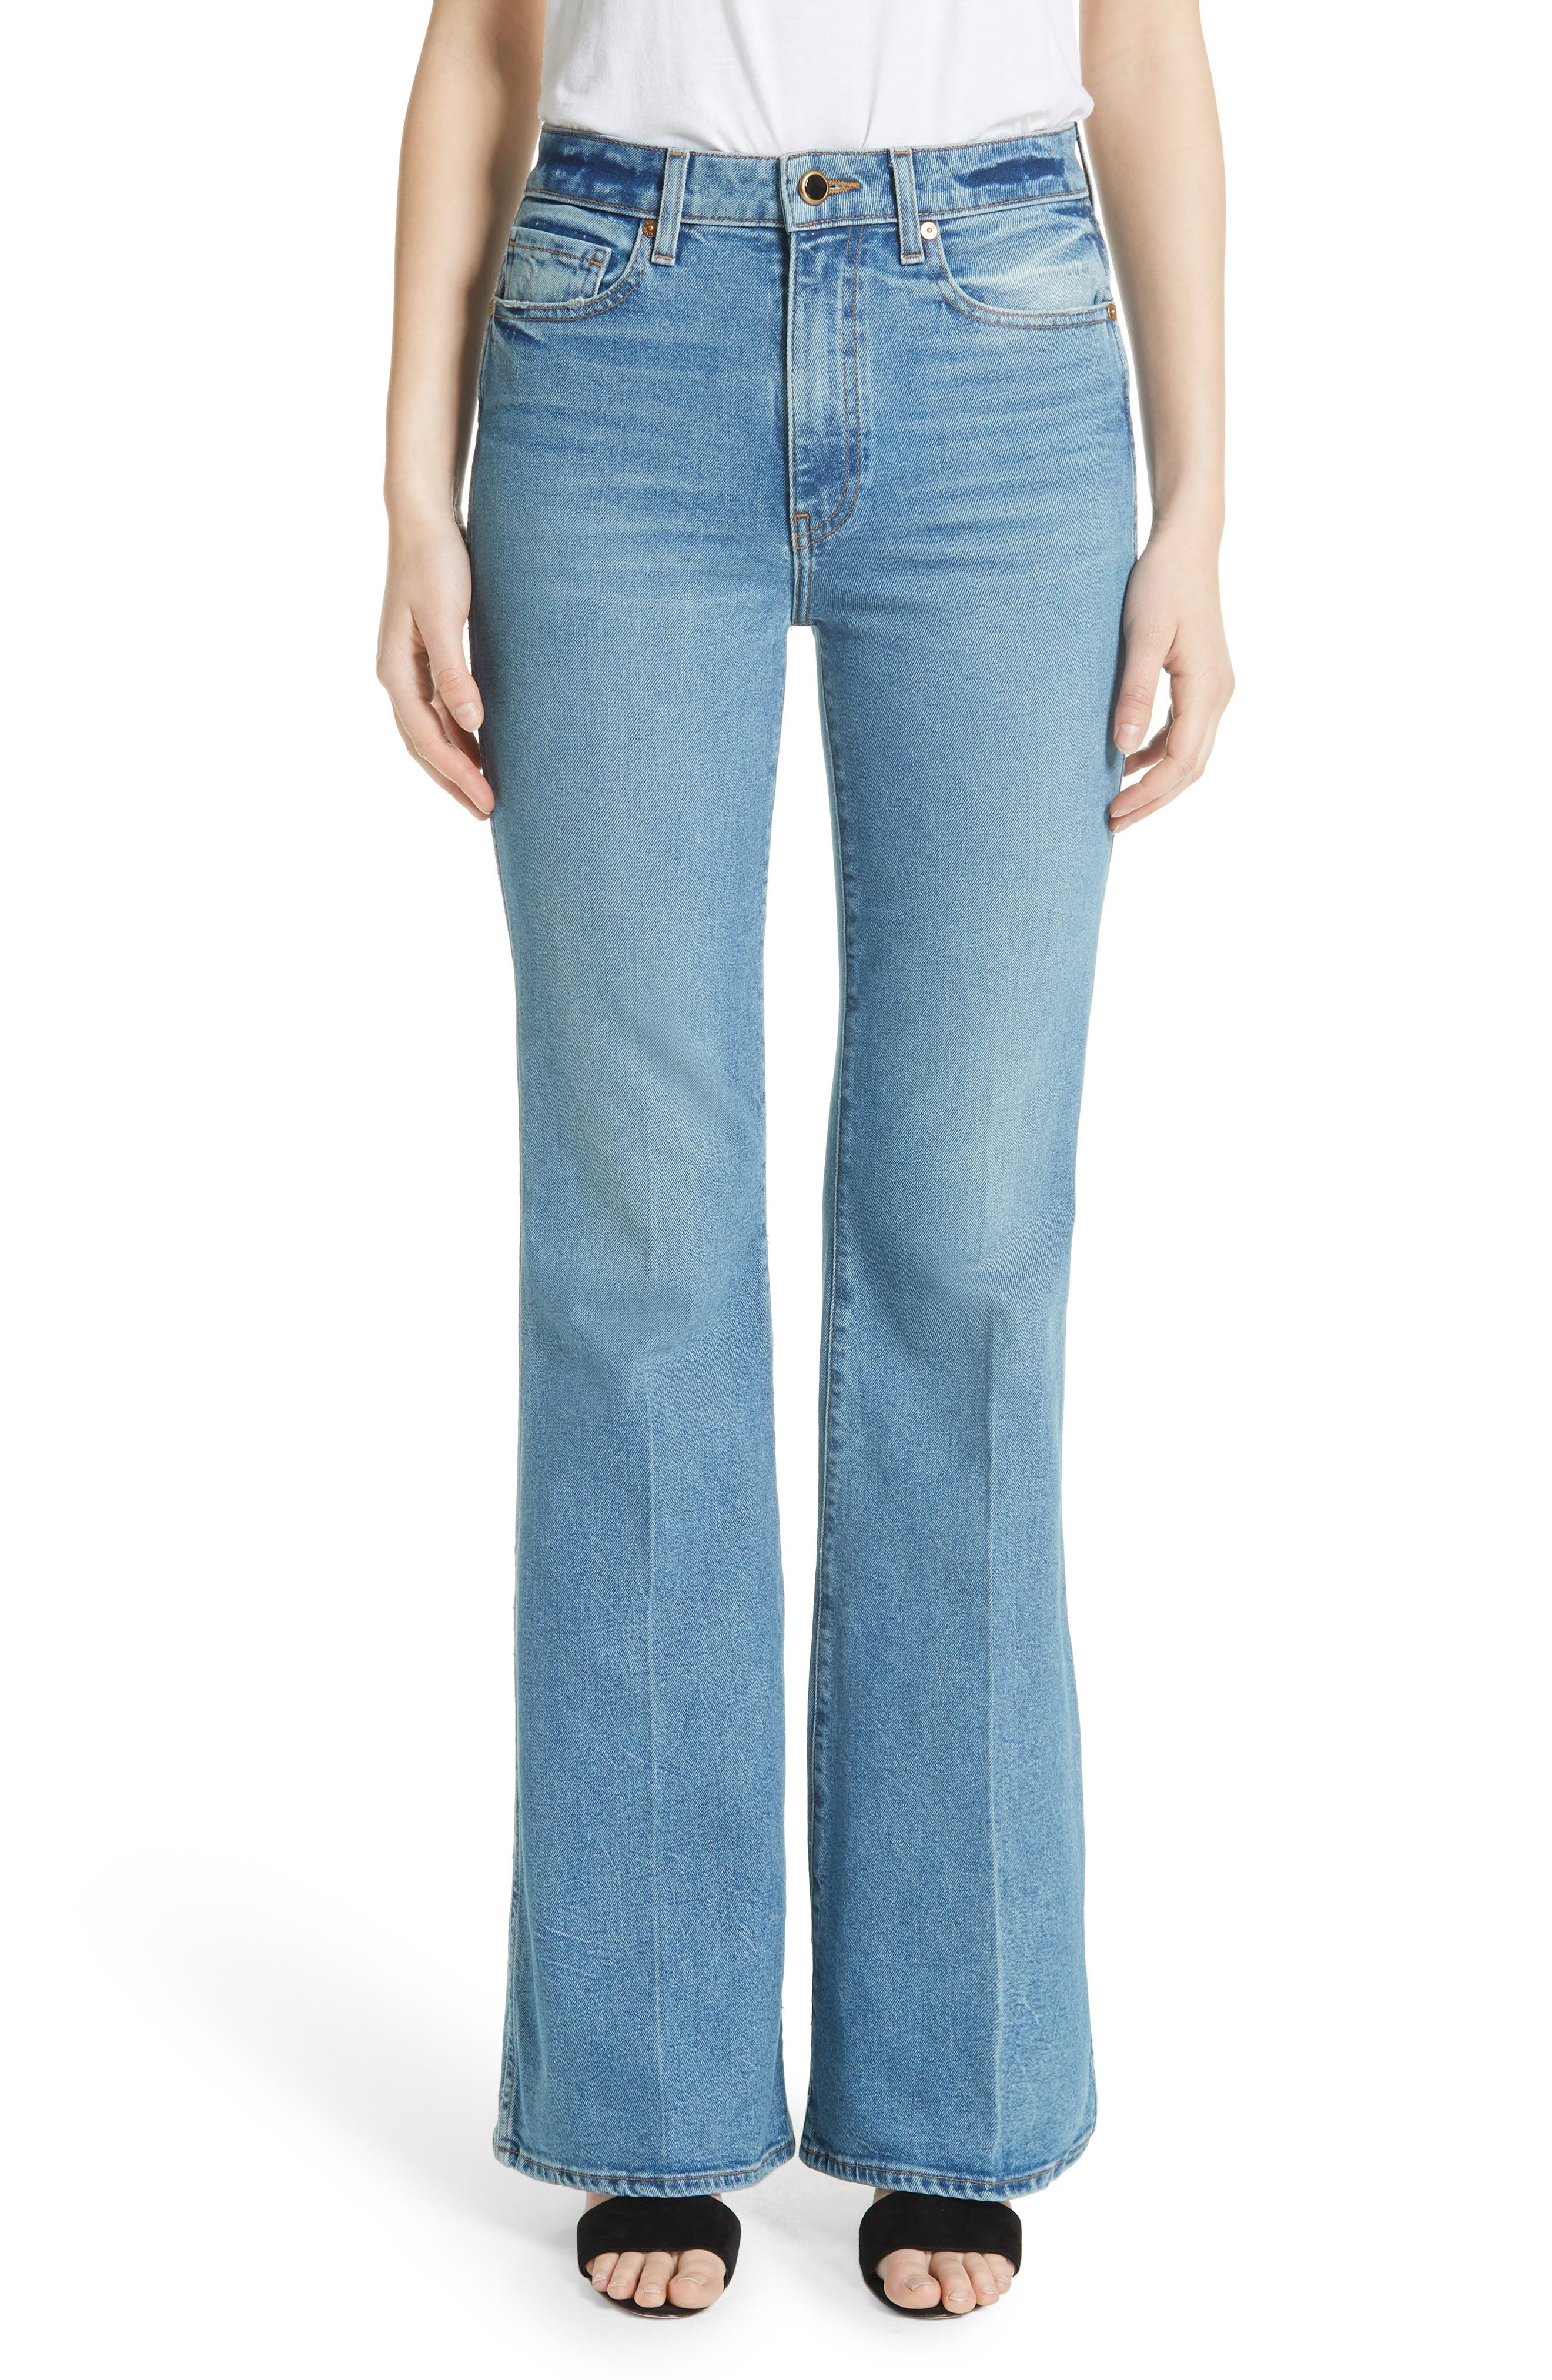 Reece Flare Jeans,                             Main thumbnail 1, color,                             401